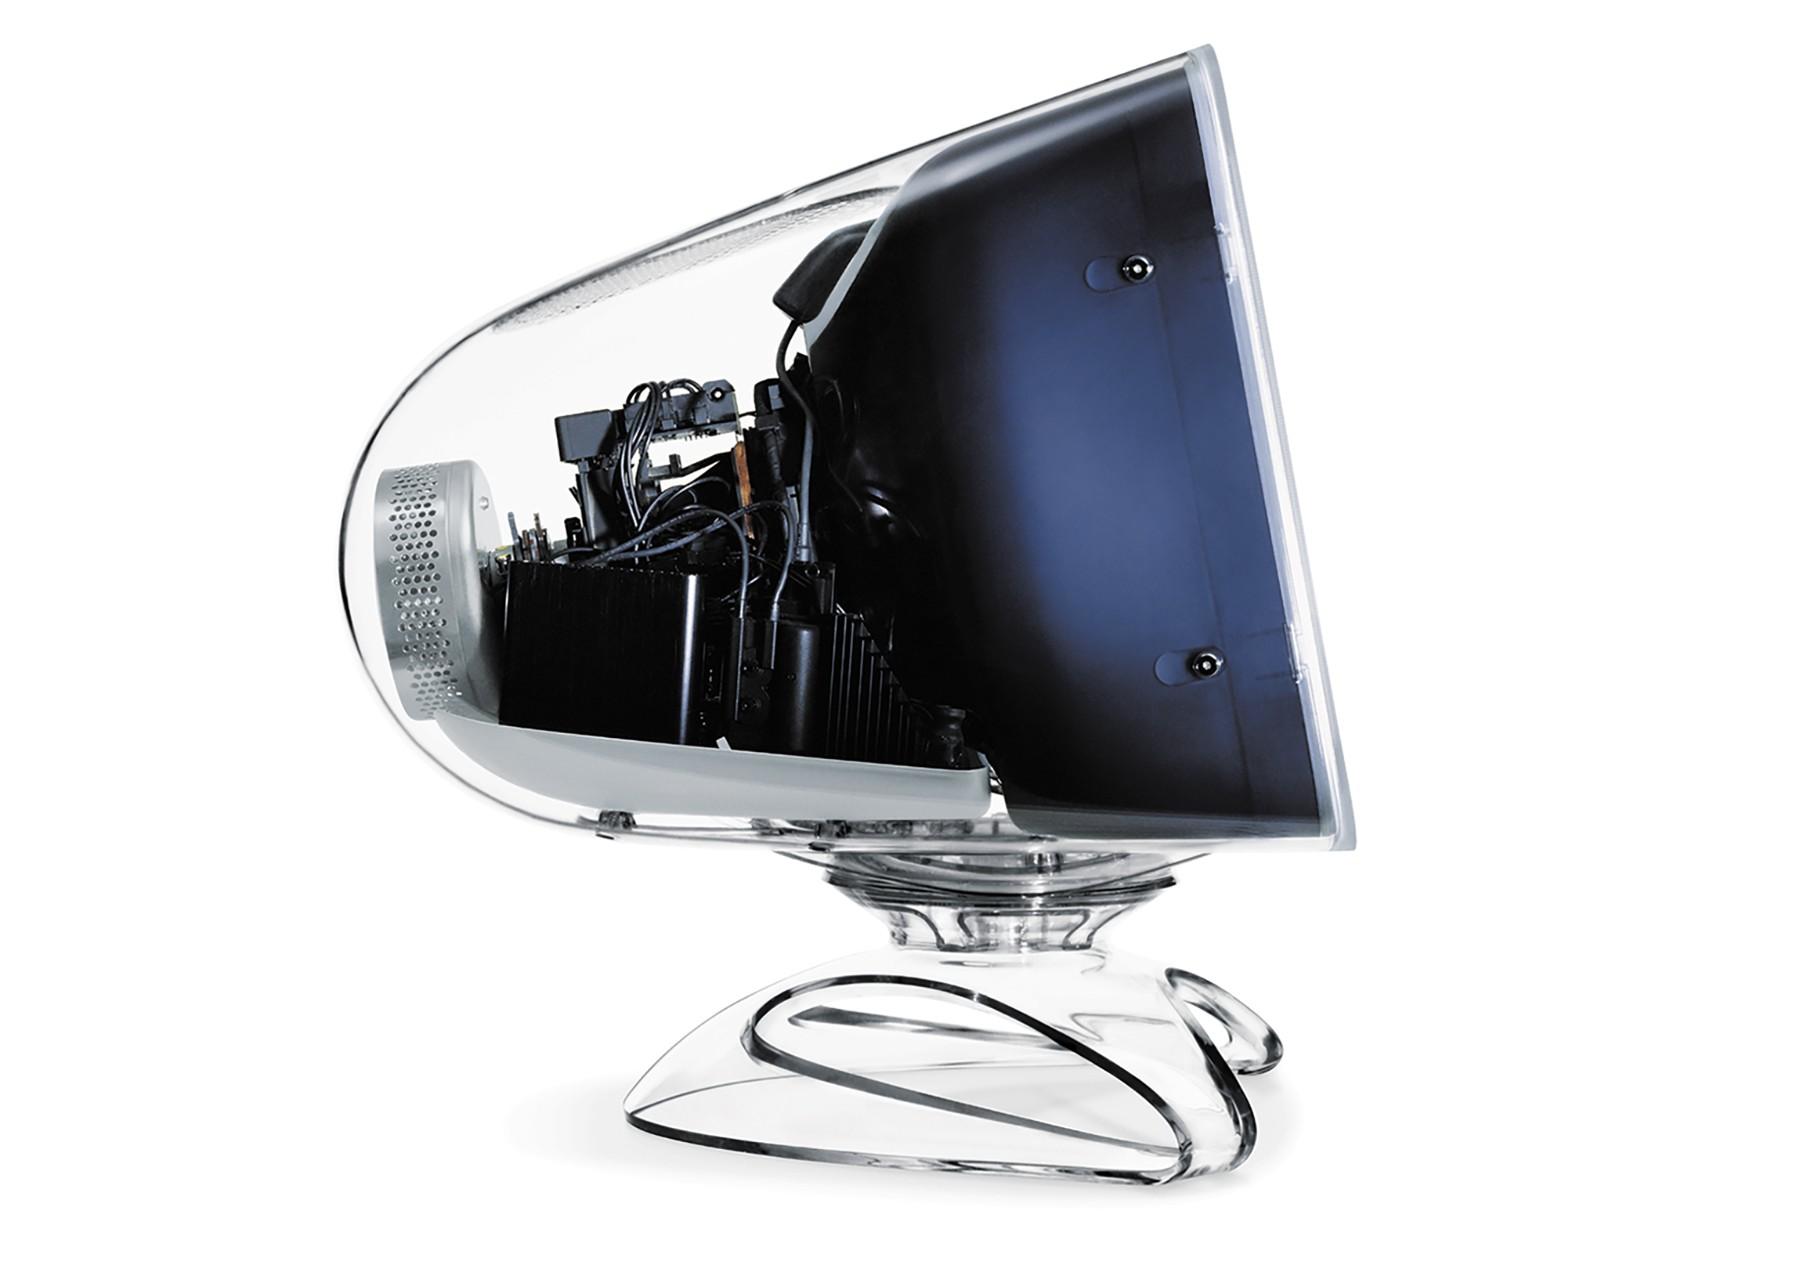 Apple Studio Display (17-inch ADC) (2000)